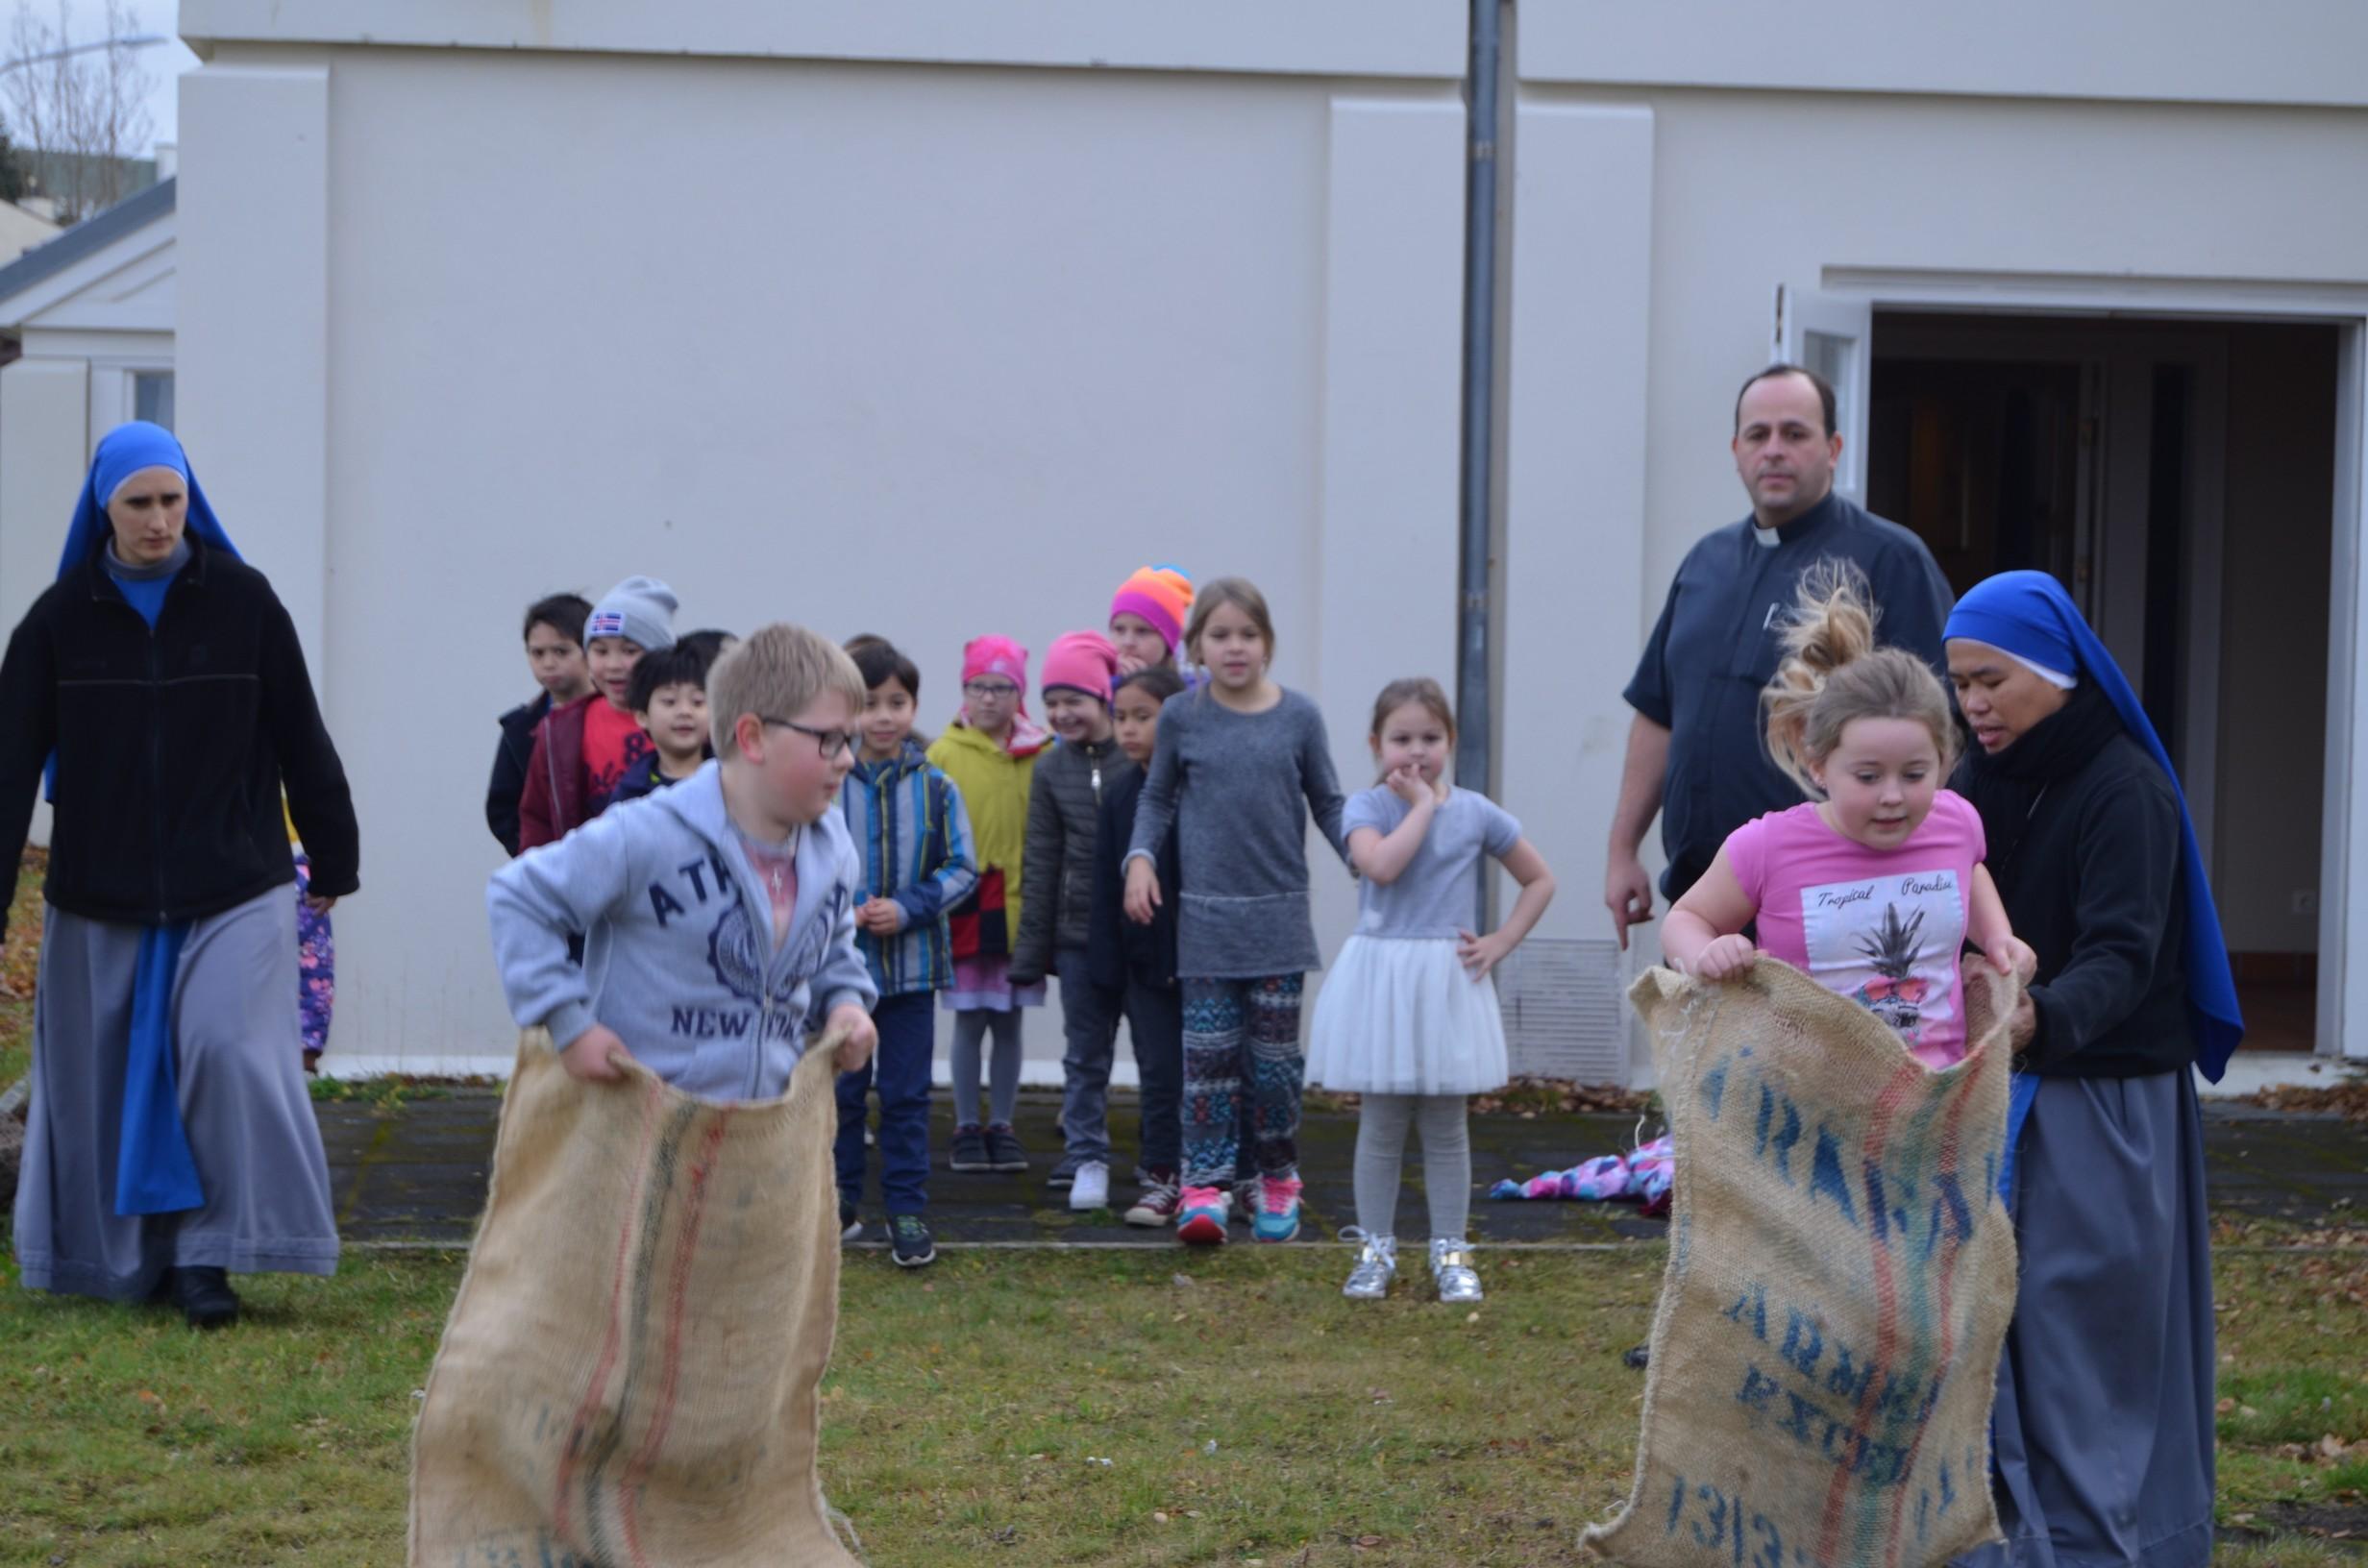 IVE-SSVM-Retreat-Comunion-kids-Iceland7